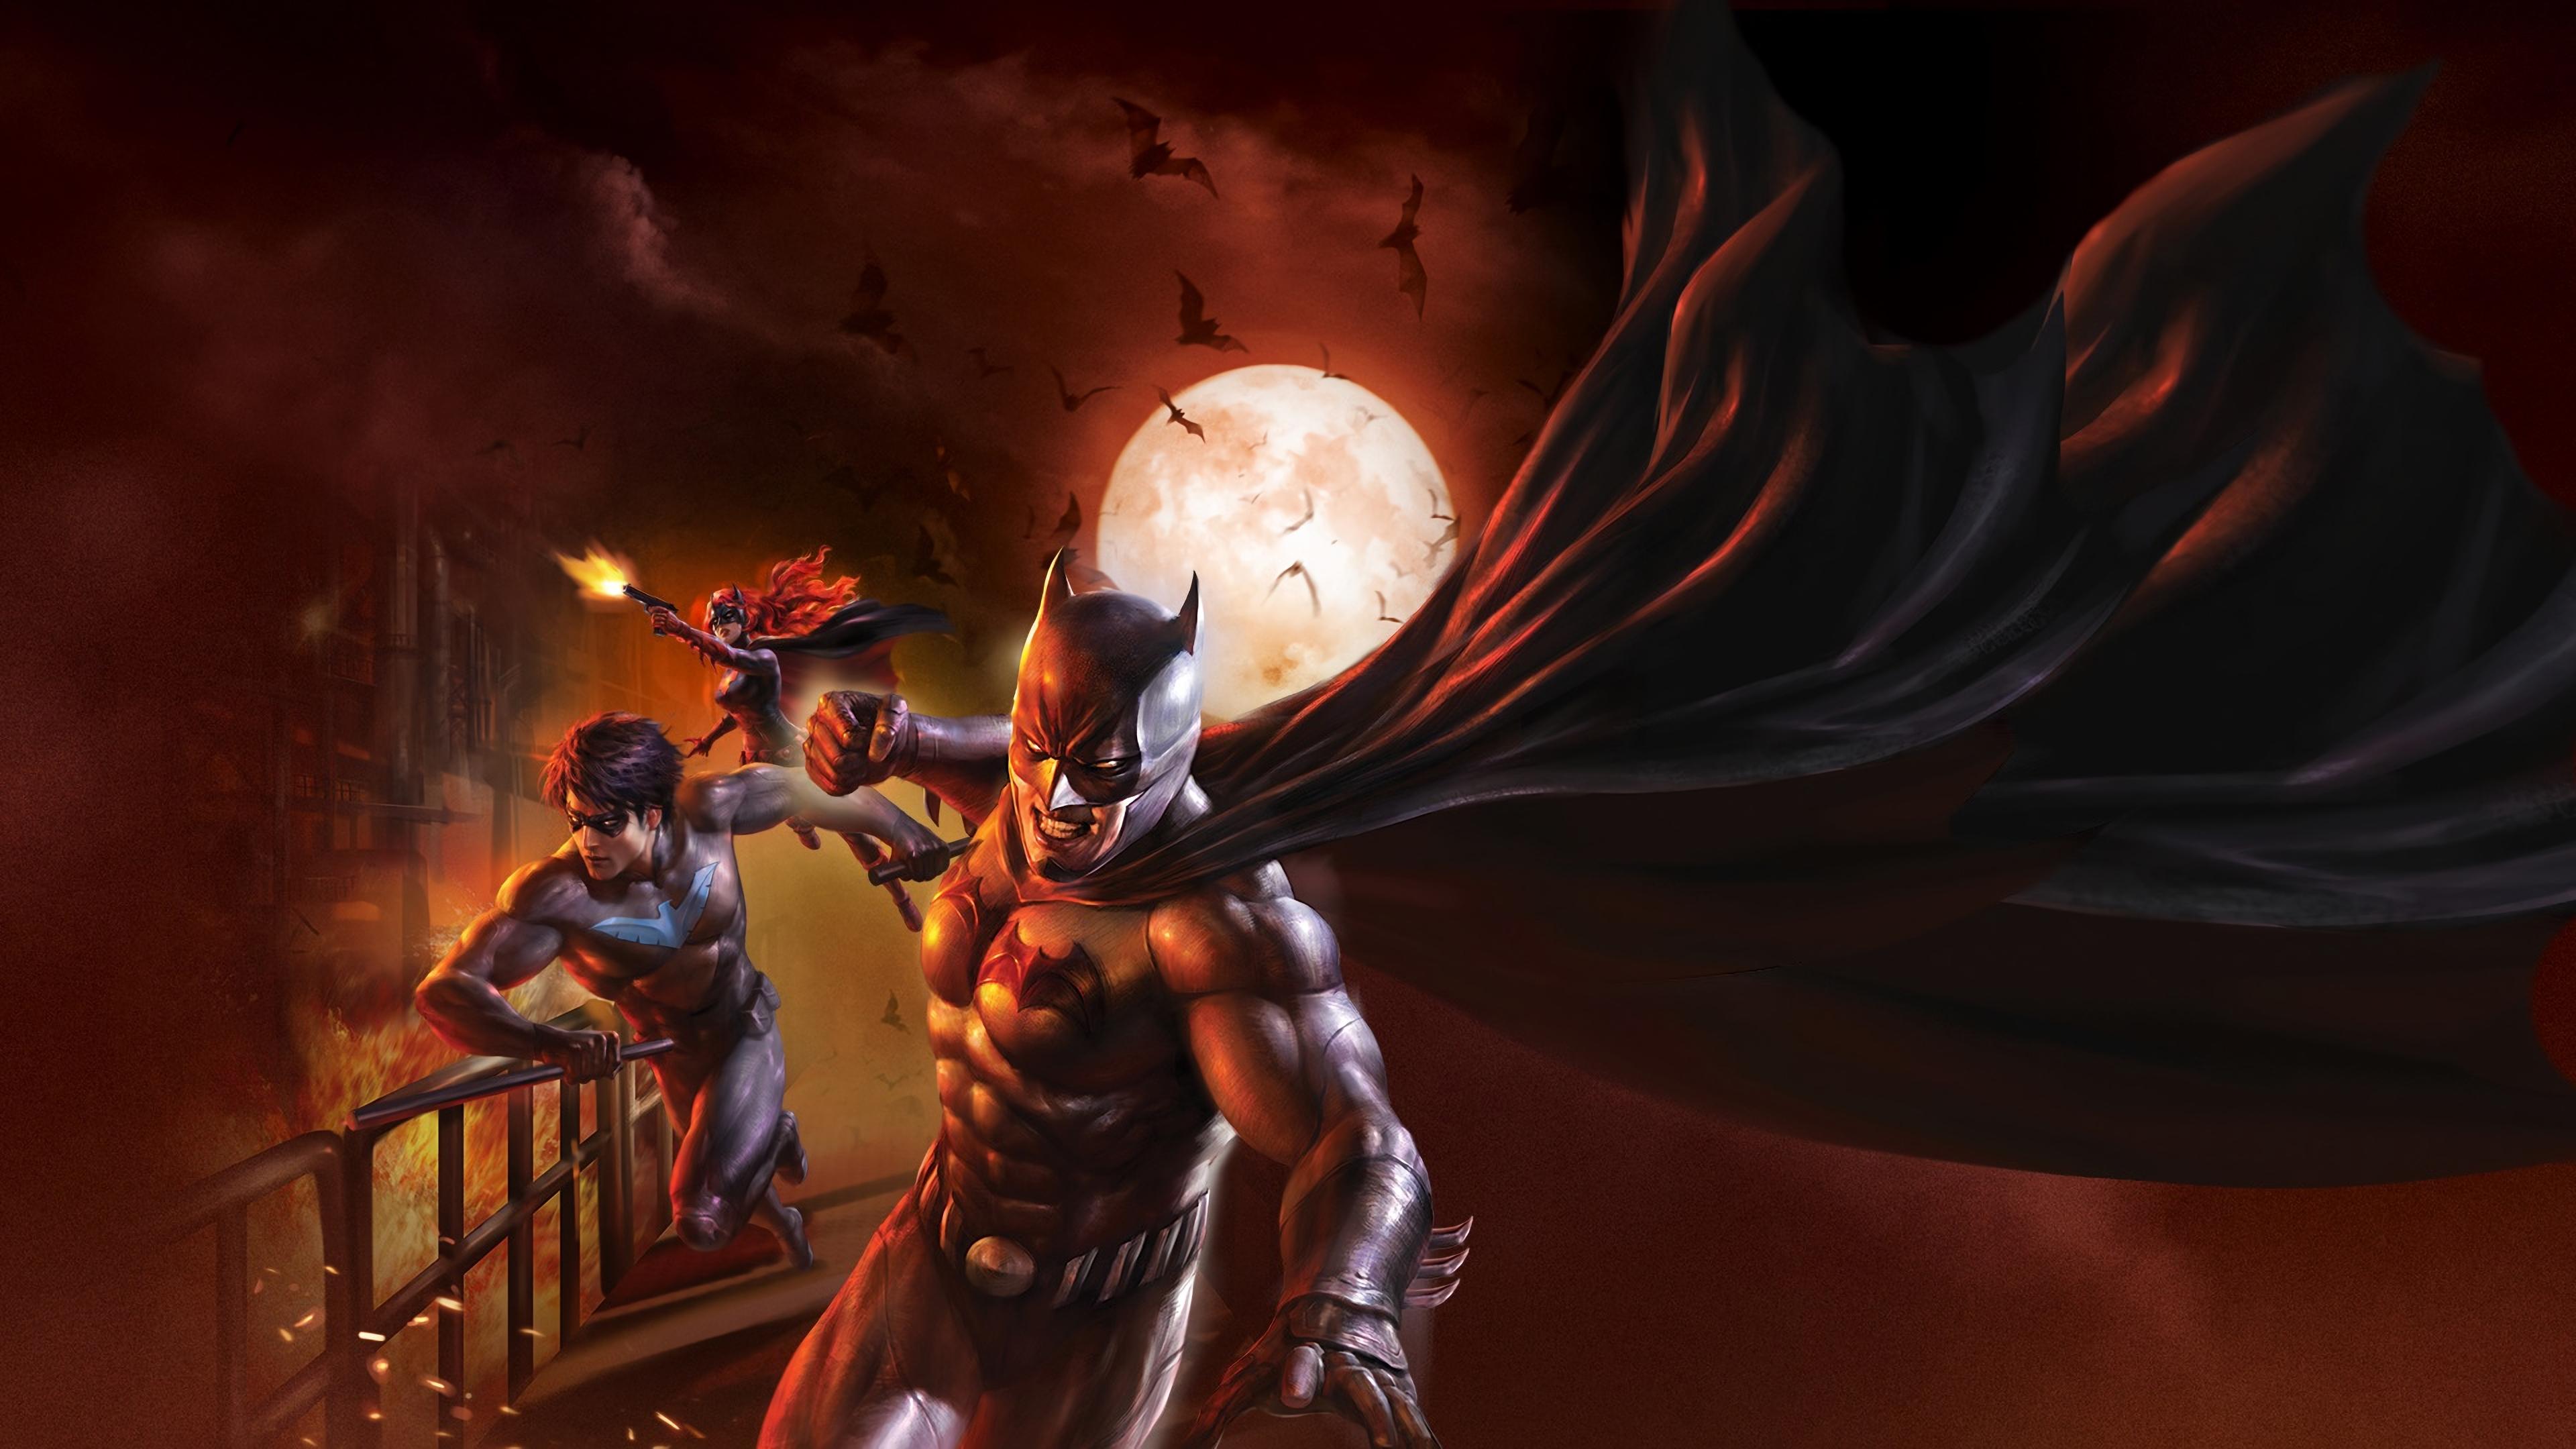 batman bad blood 1569186957 - Batman Bad Blood - superheroes wallpapers, hd-wallpapers, batman wallpapers, batgirl wallpapers, 4k-wallpapers